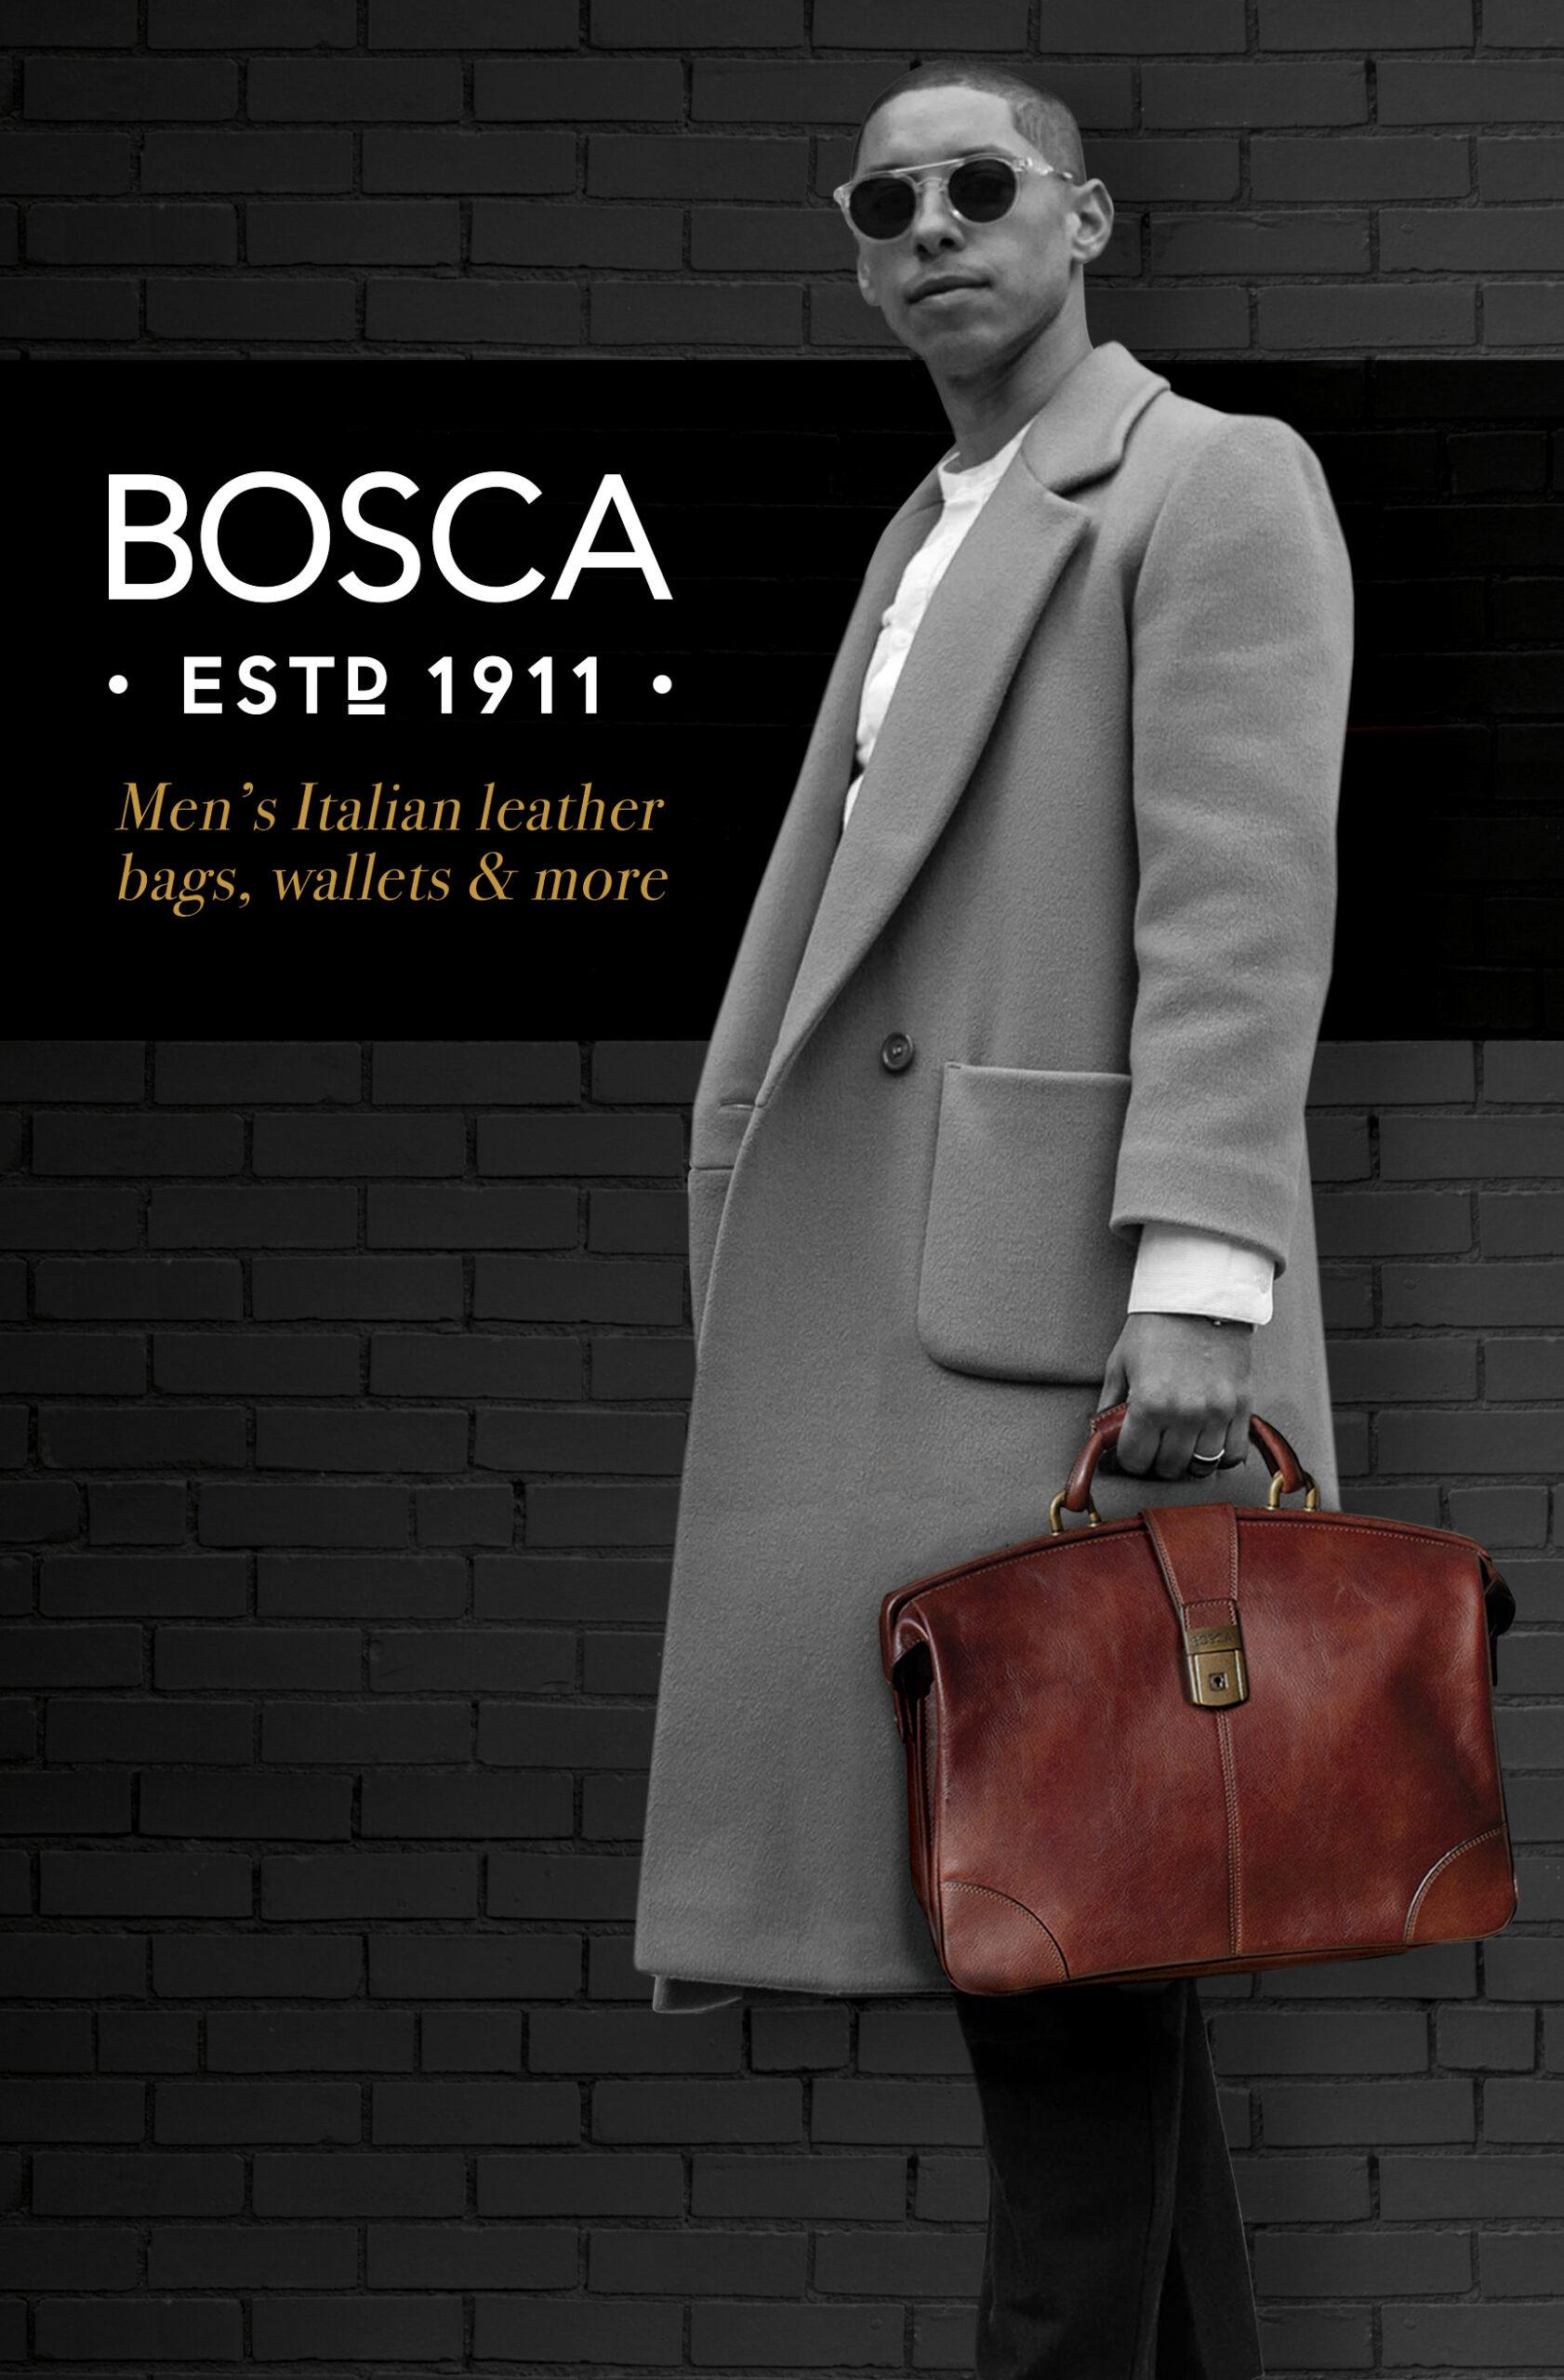 BOSCA 2019 AD